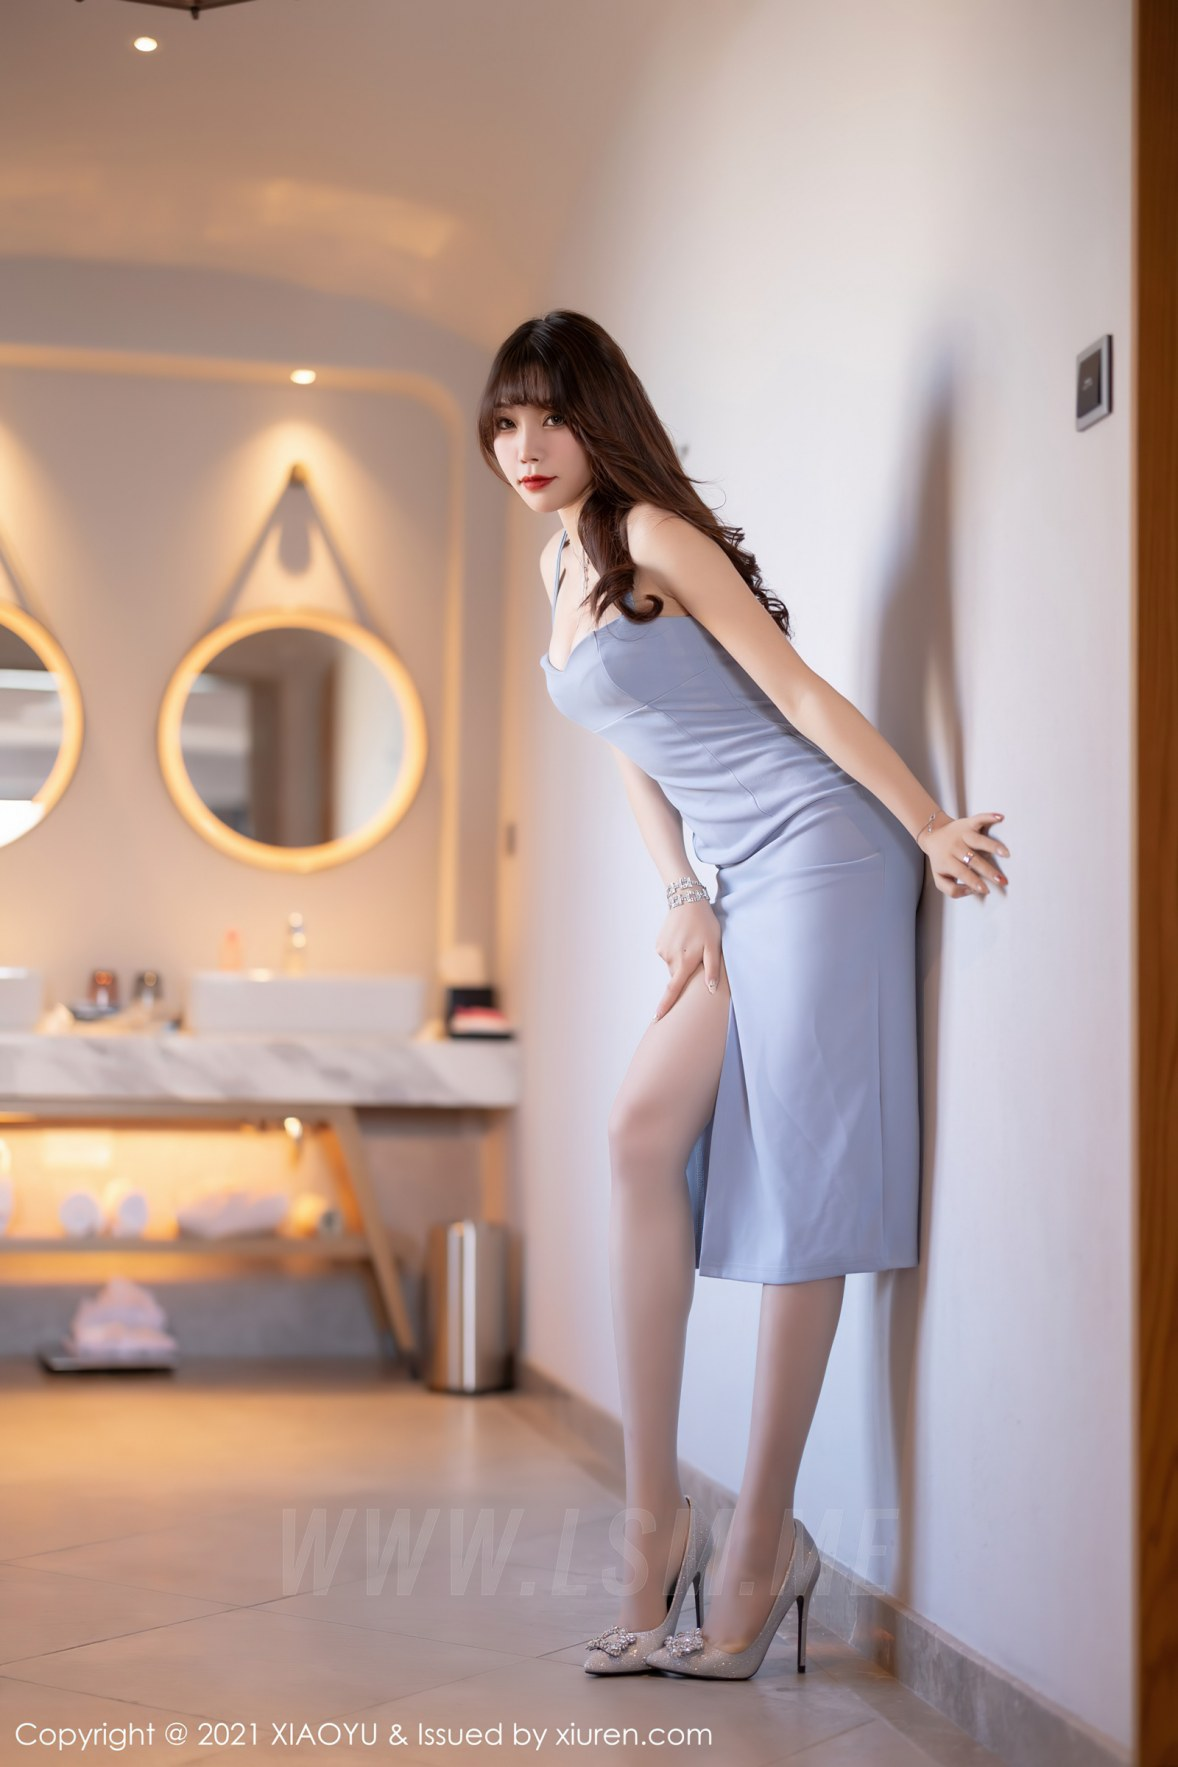 XIAOYU  语画界 Vol.563 长裙与精致内衣 芝芝Booty 青岛旅拍写真3 - 3